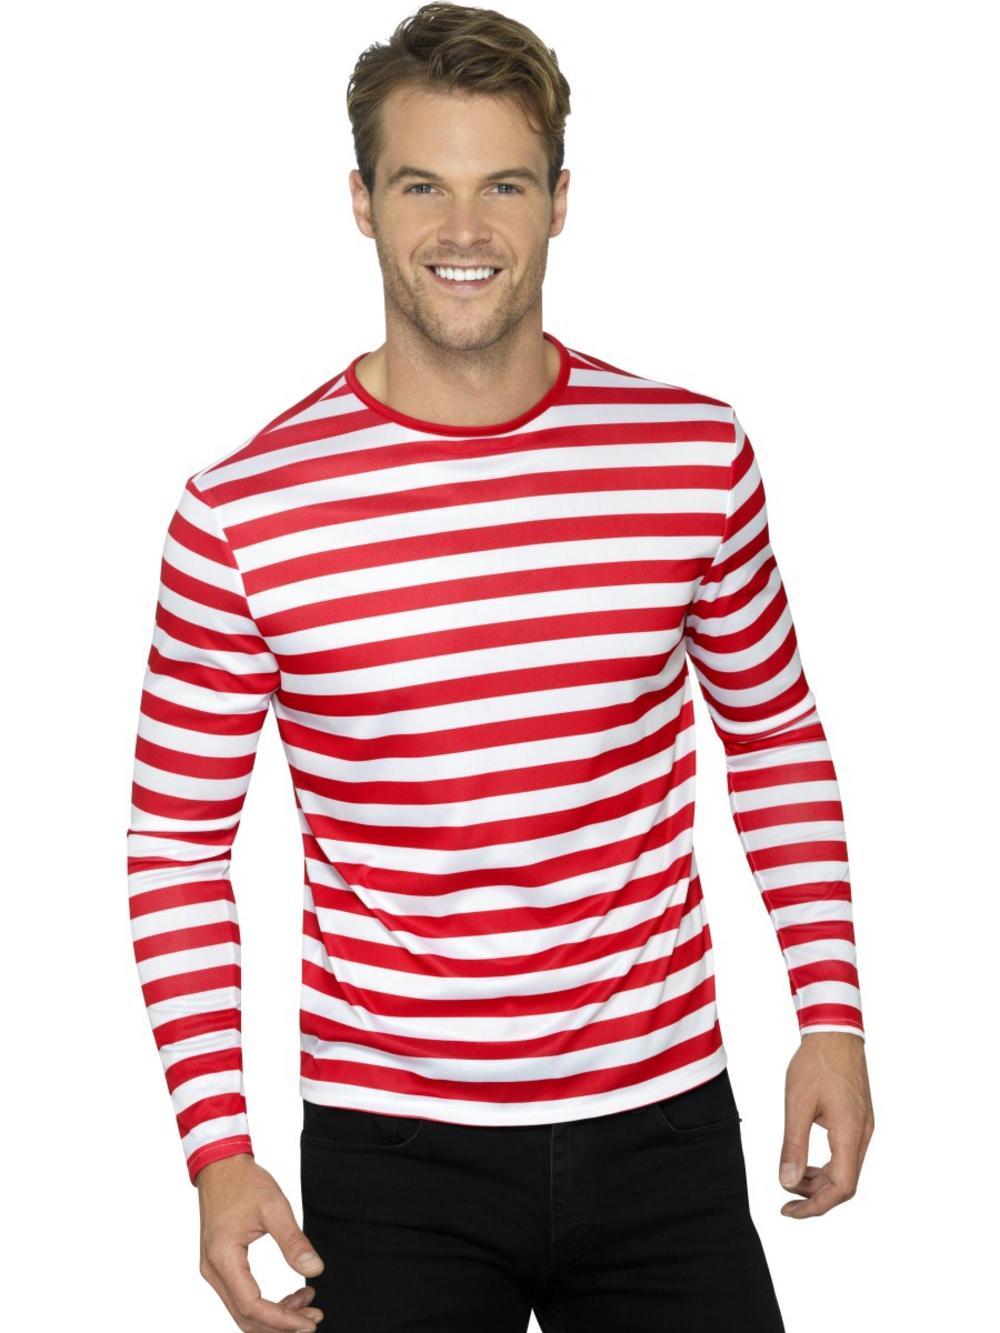 Stripy T-Shirt Red & White